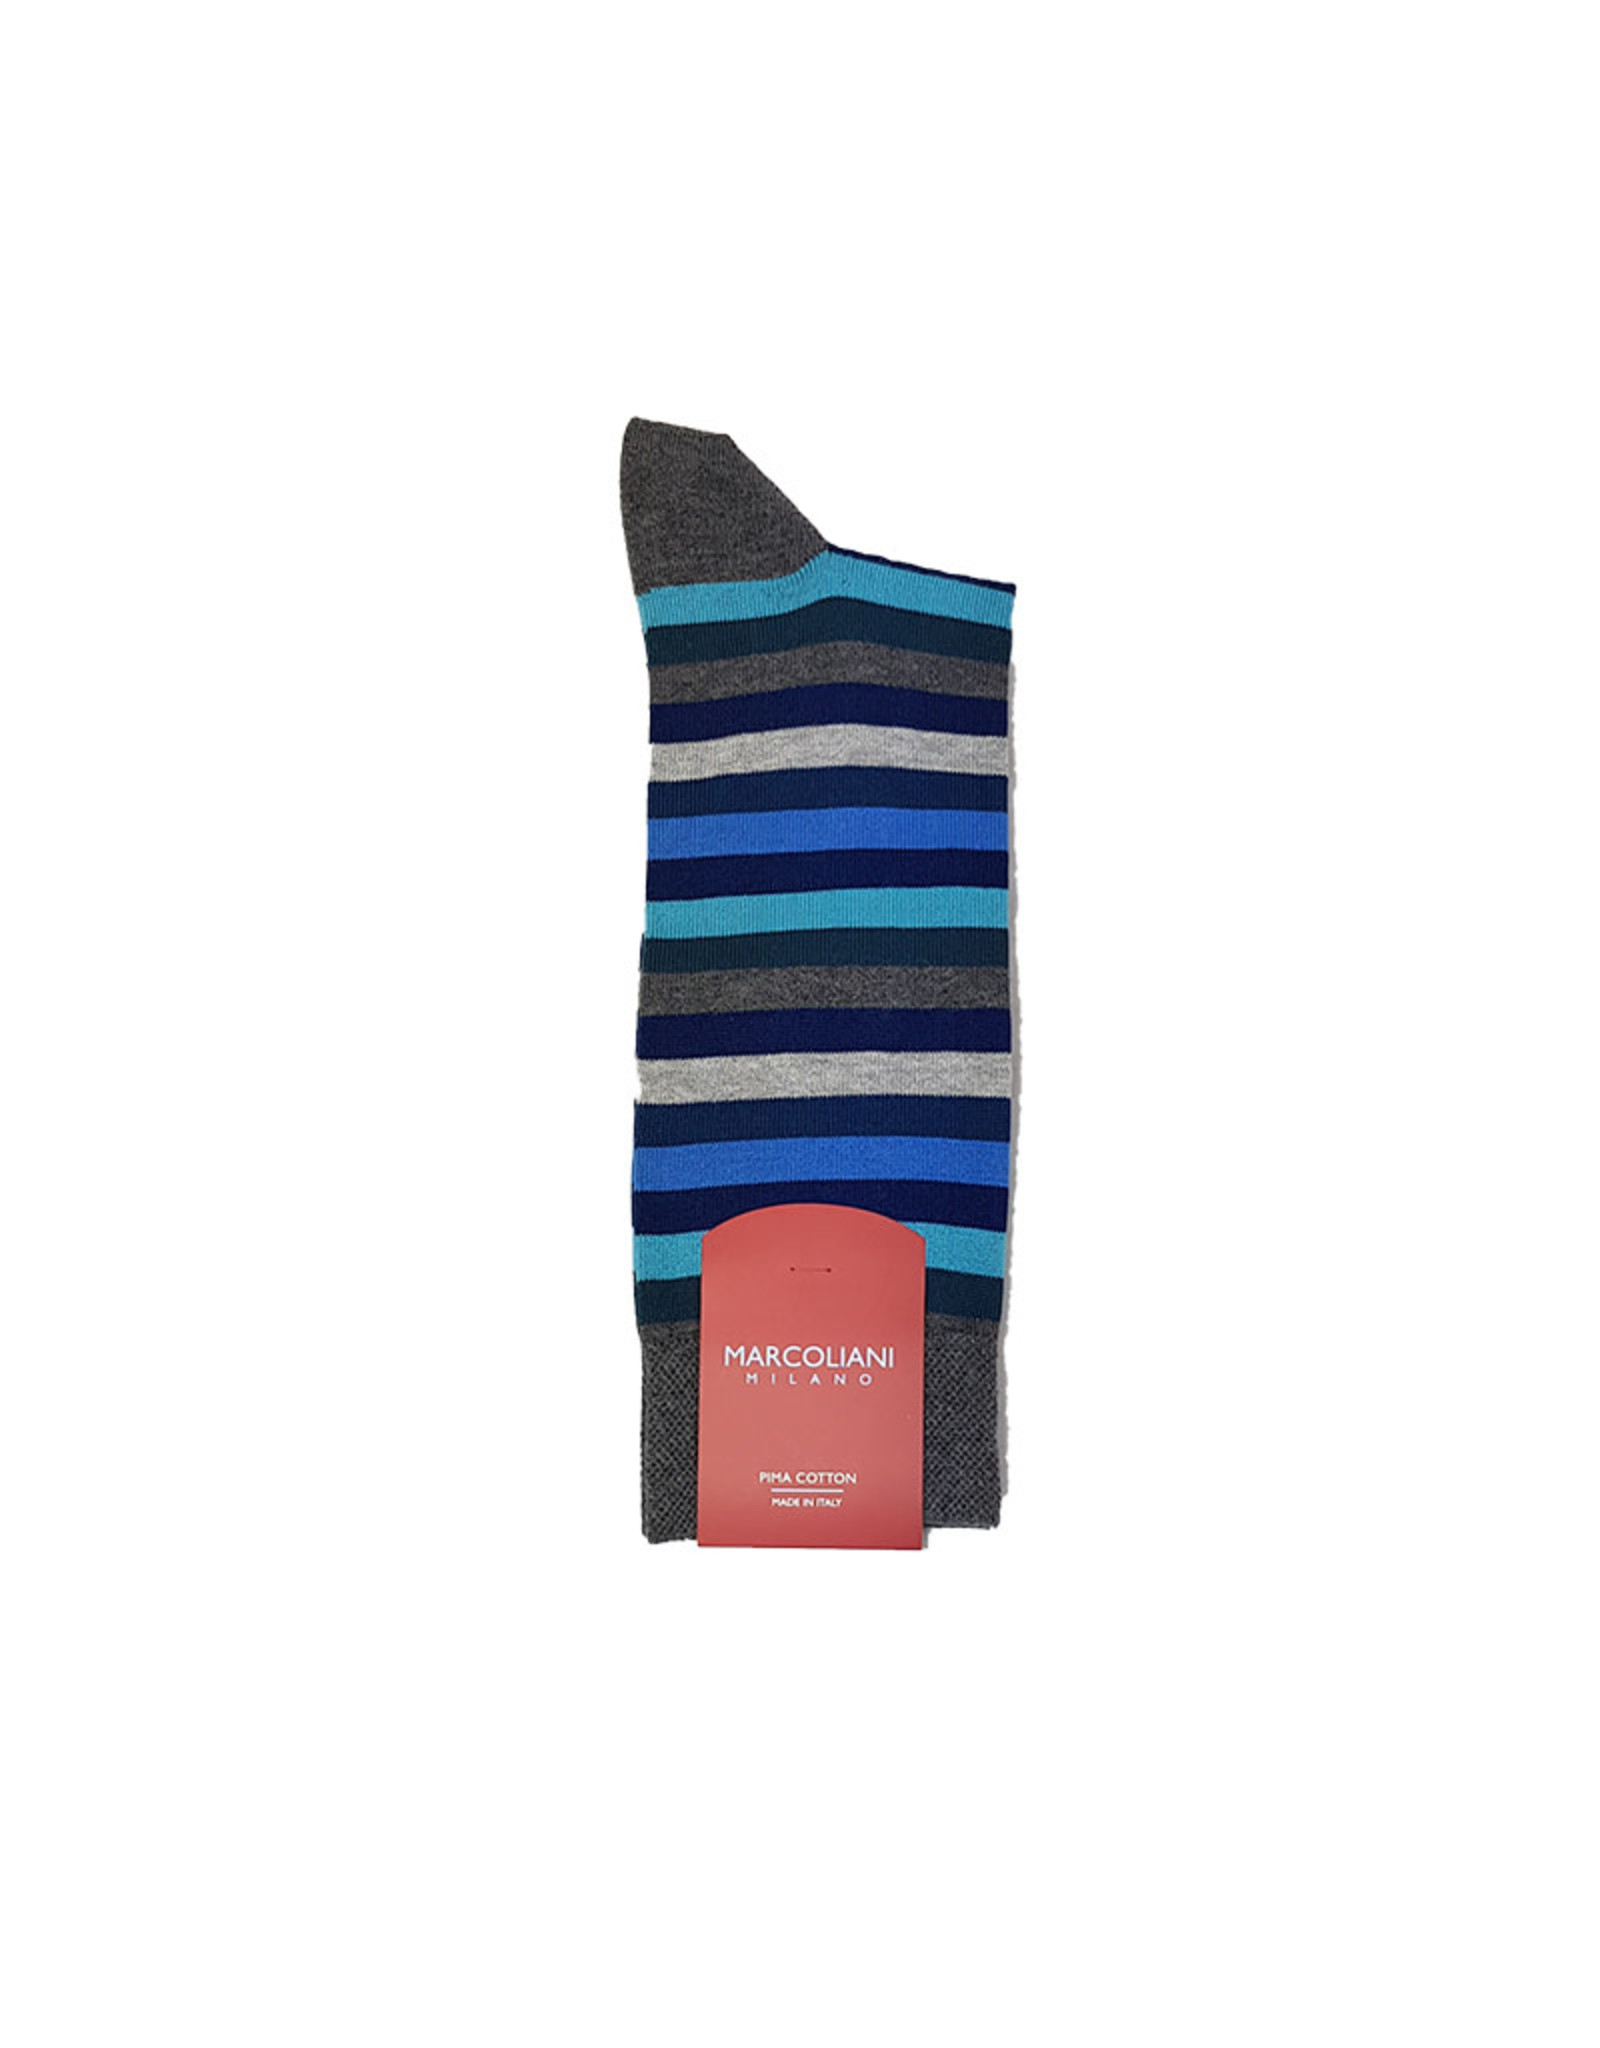 Marcoliani Marcoliani sokken blauw gestreept 4040T/501